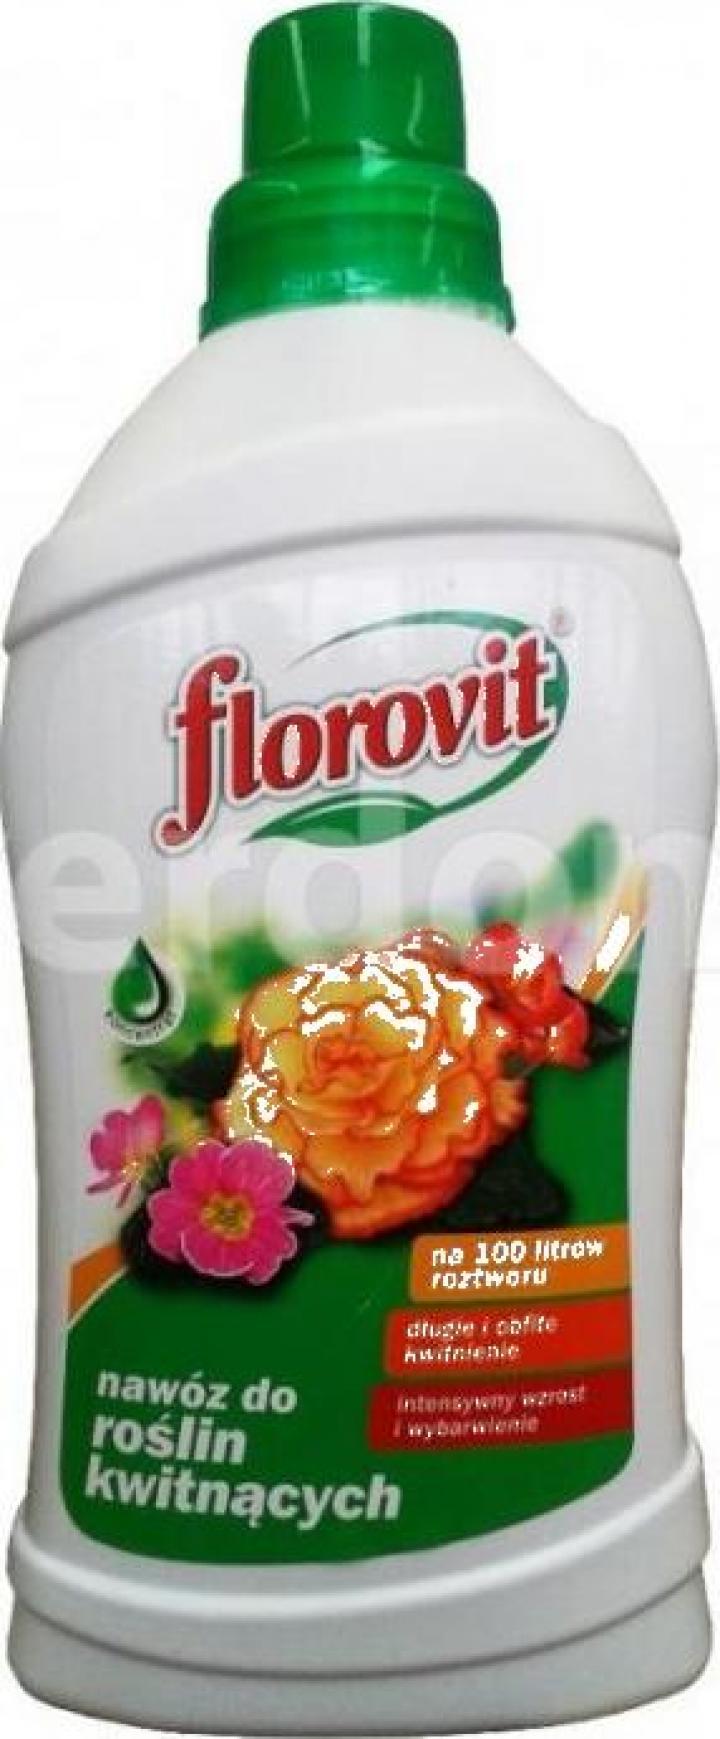 Ingrasamant specializat lichid pentru plante cu flori